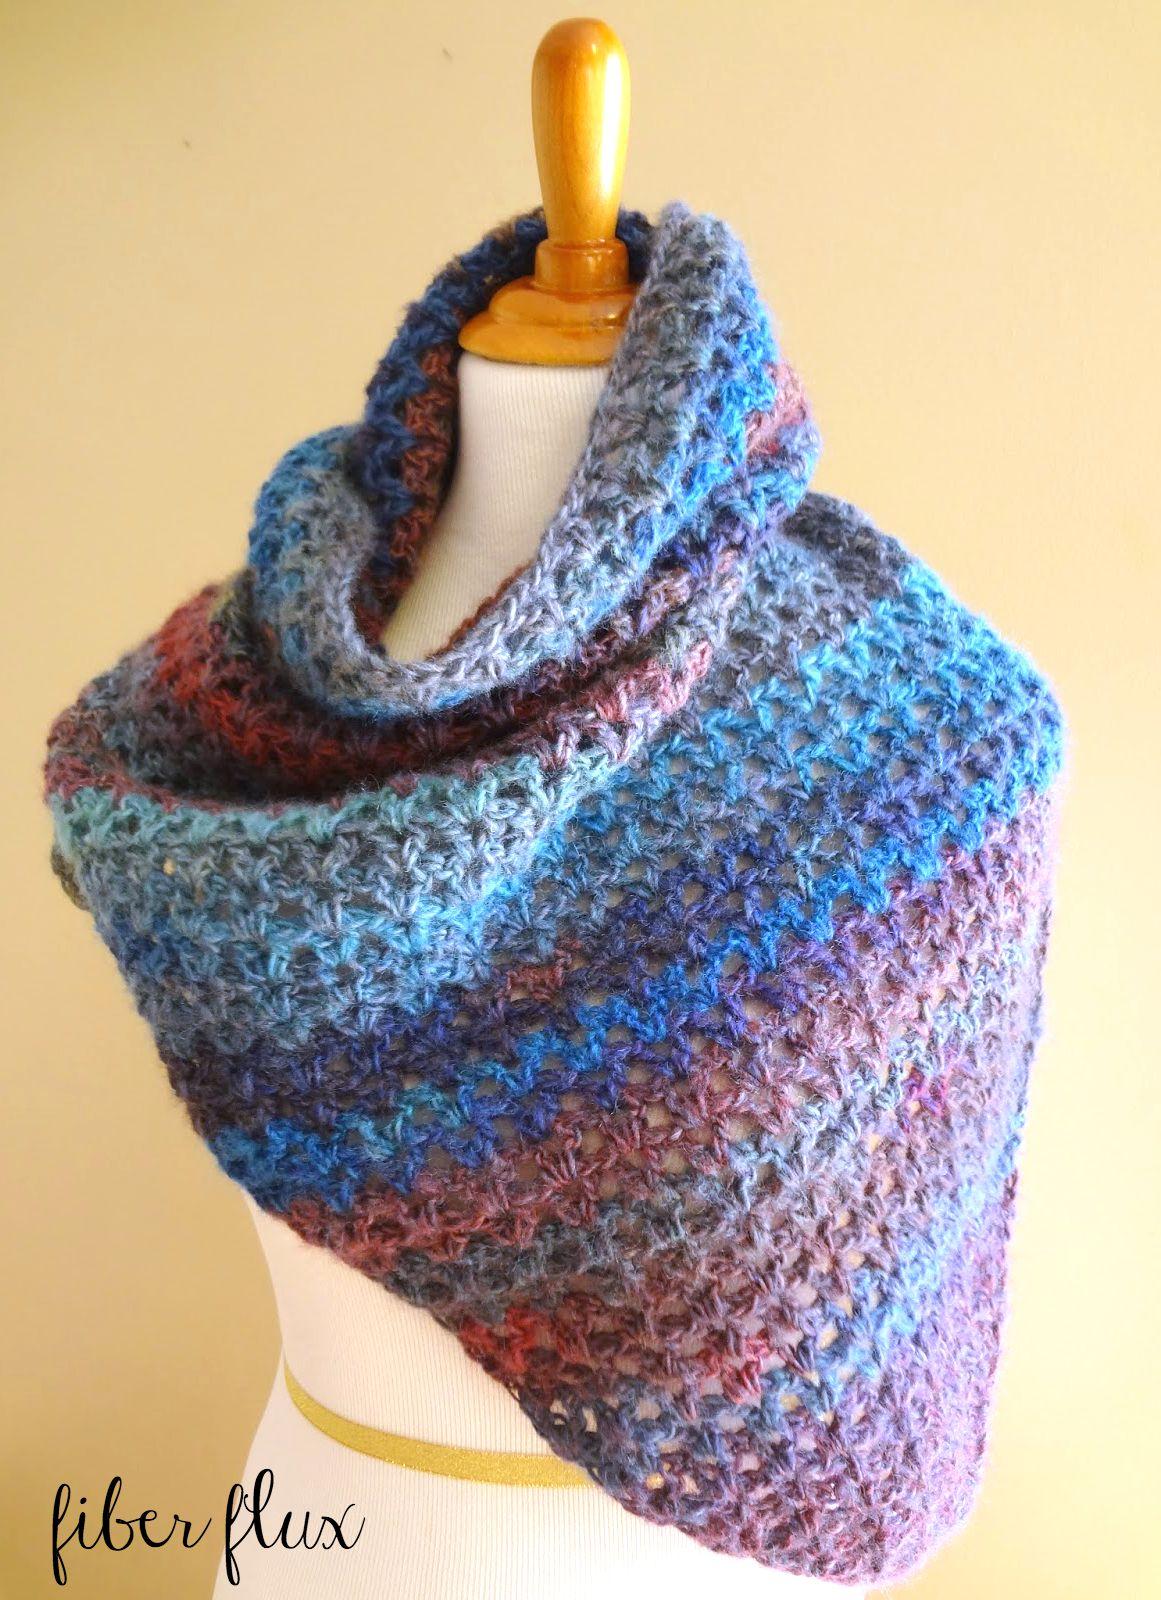 Crochet Patterns Free Prayer Shawl : Fiber Flux: Free Crochet Pattern...Kristen Shawl!